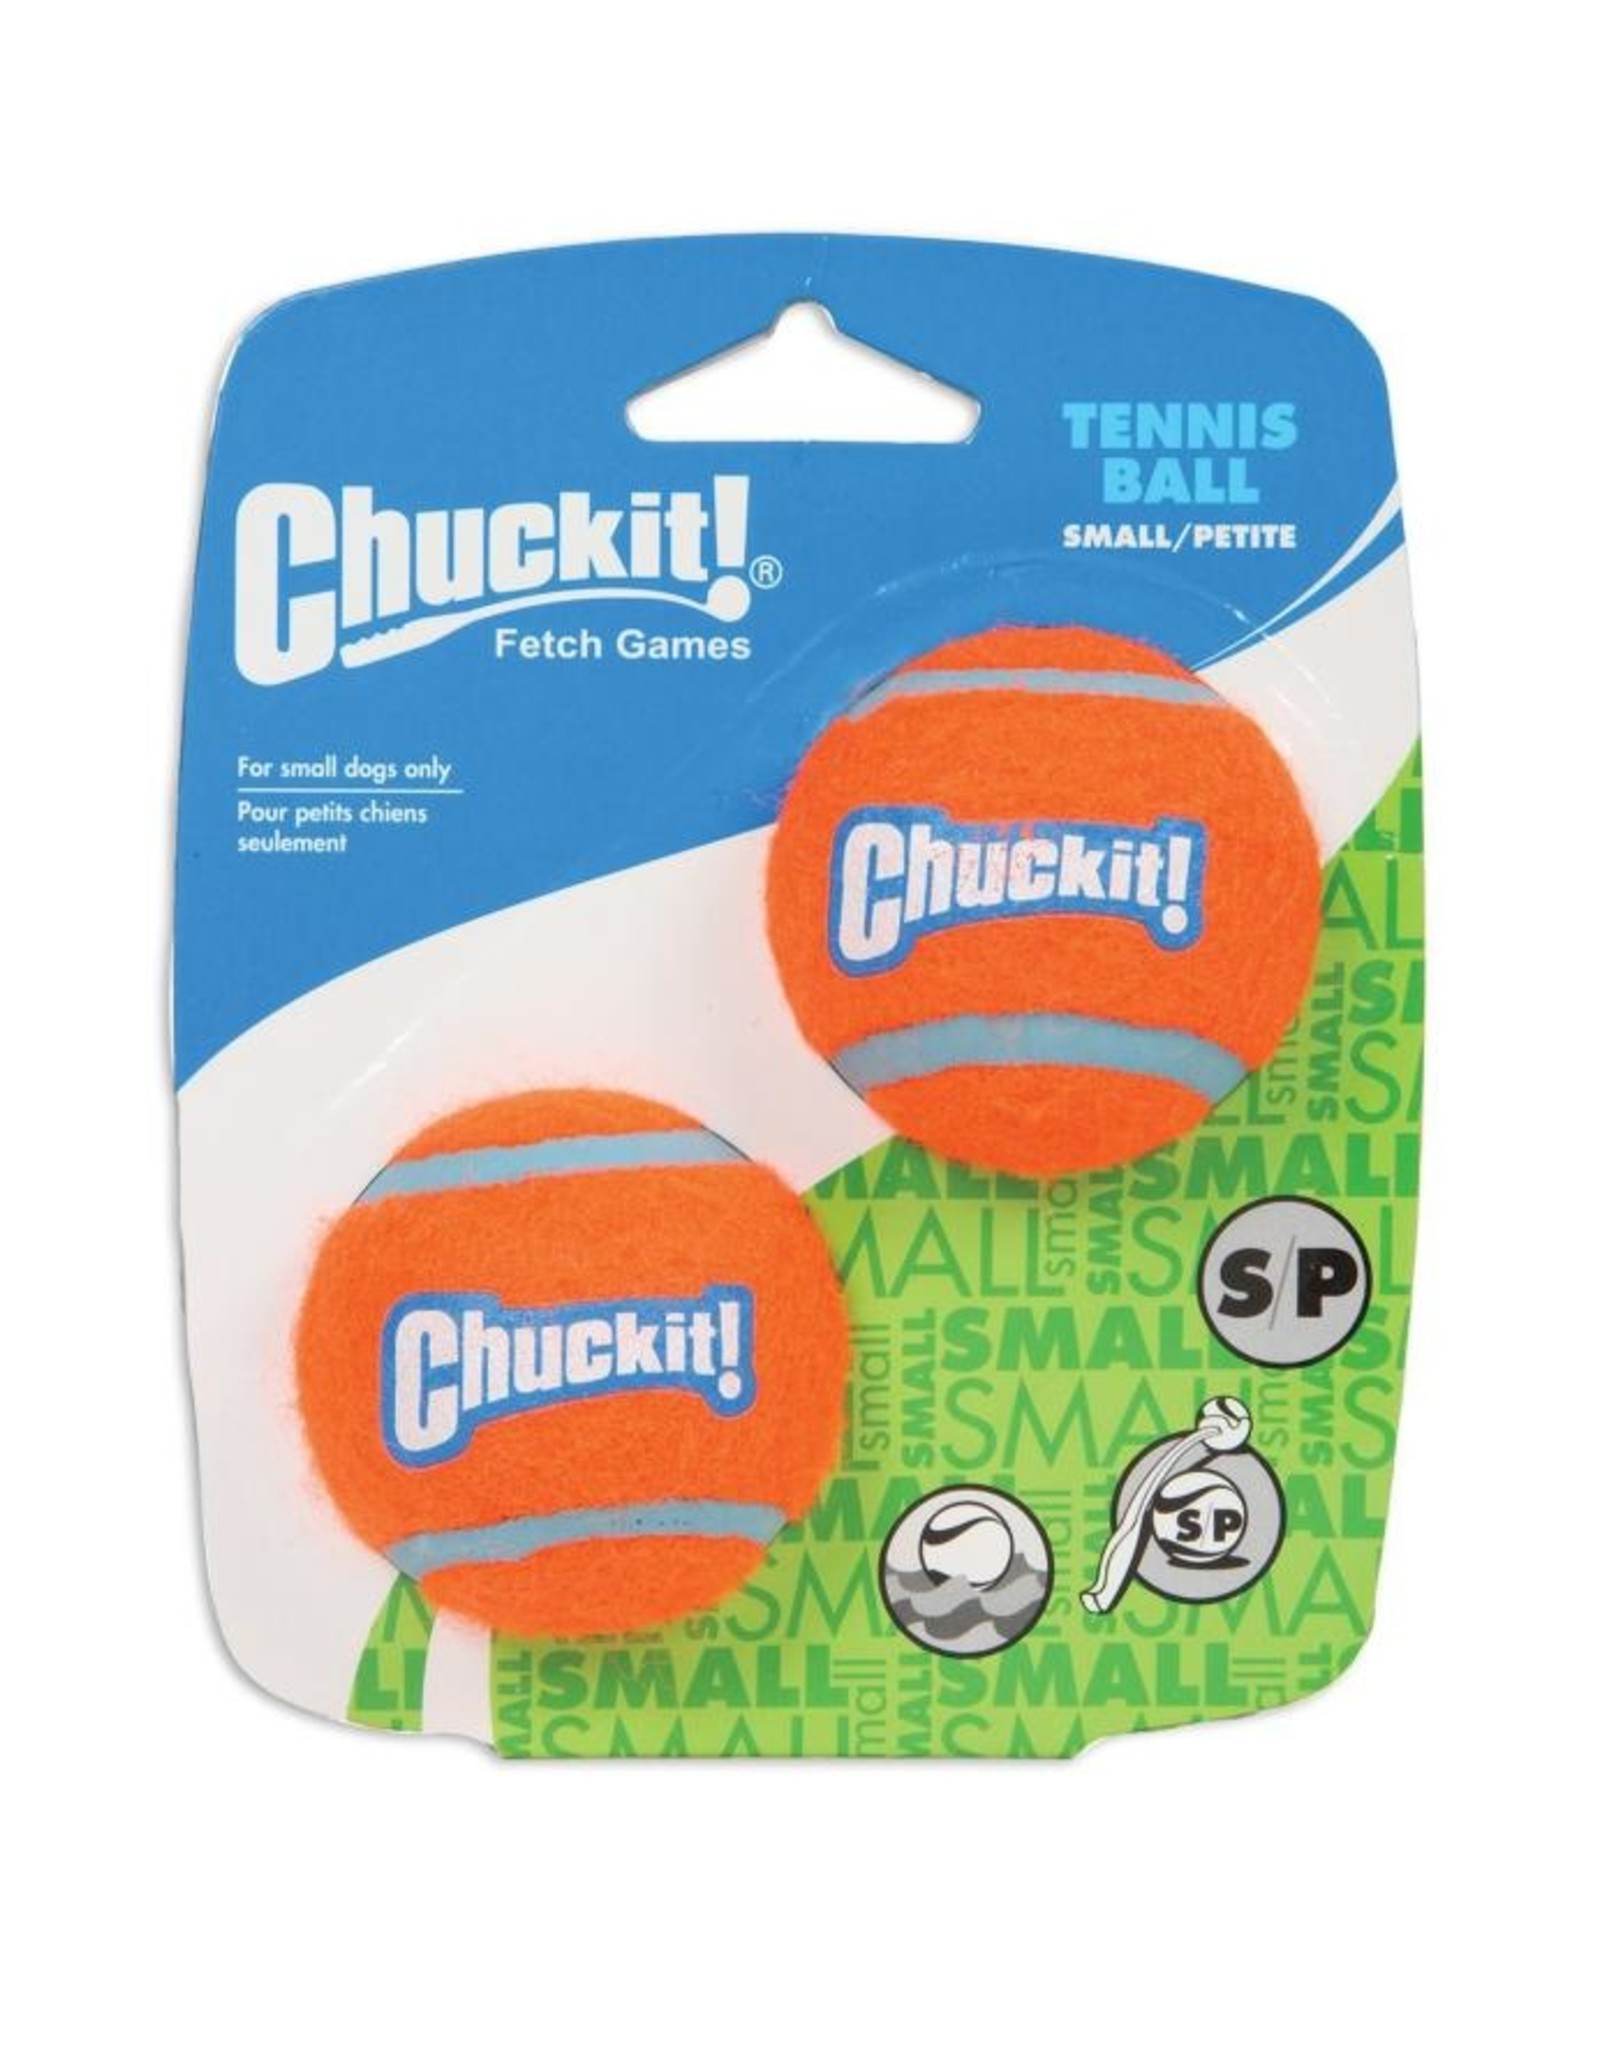 Chuckit Tennis Ball Small (2 pk)